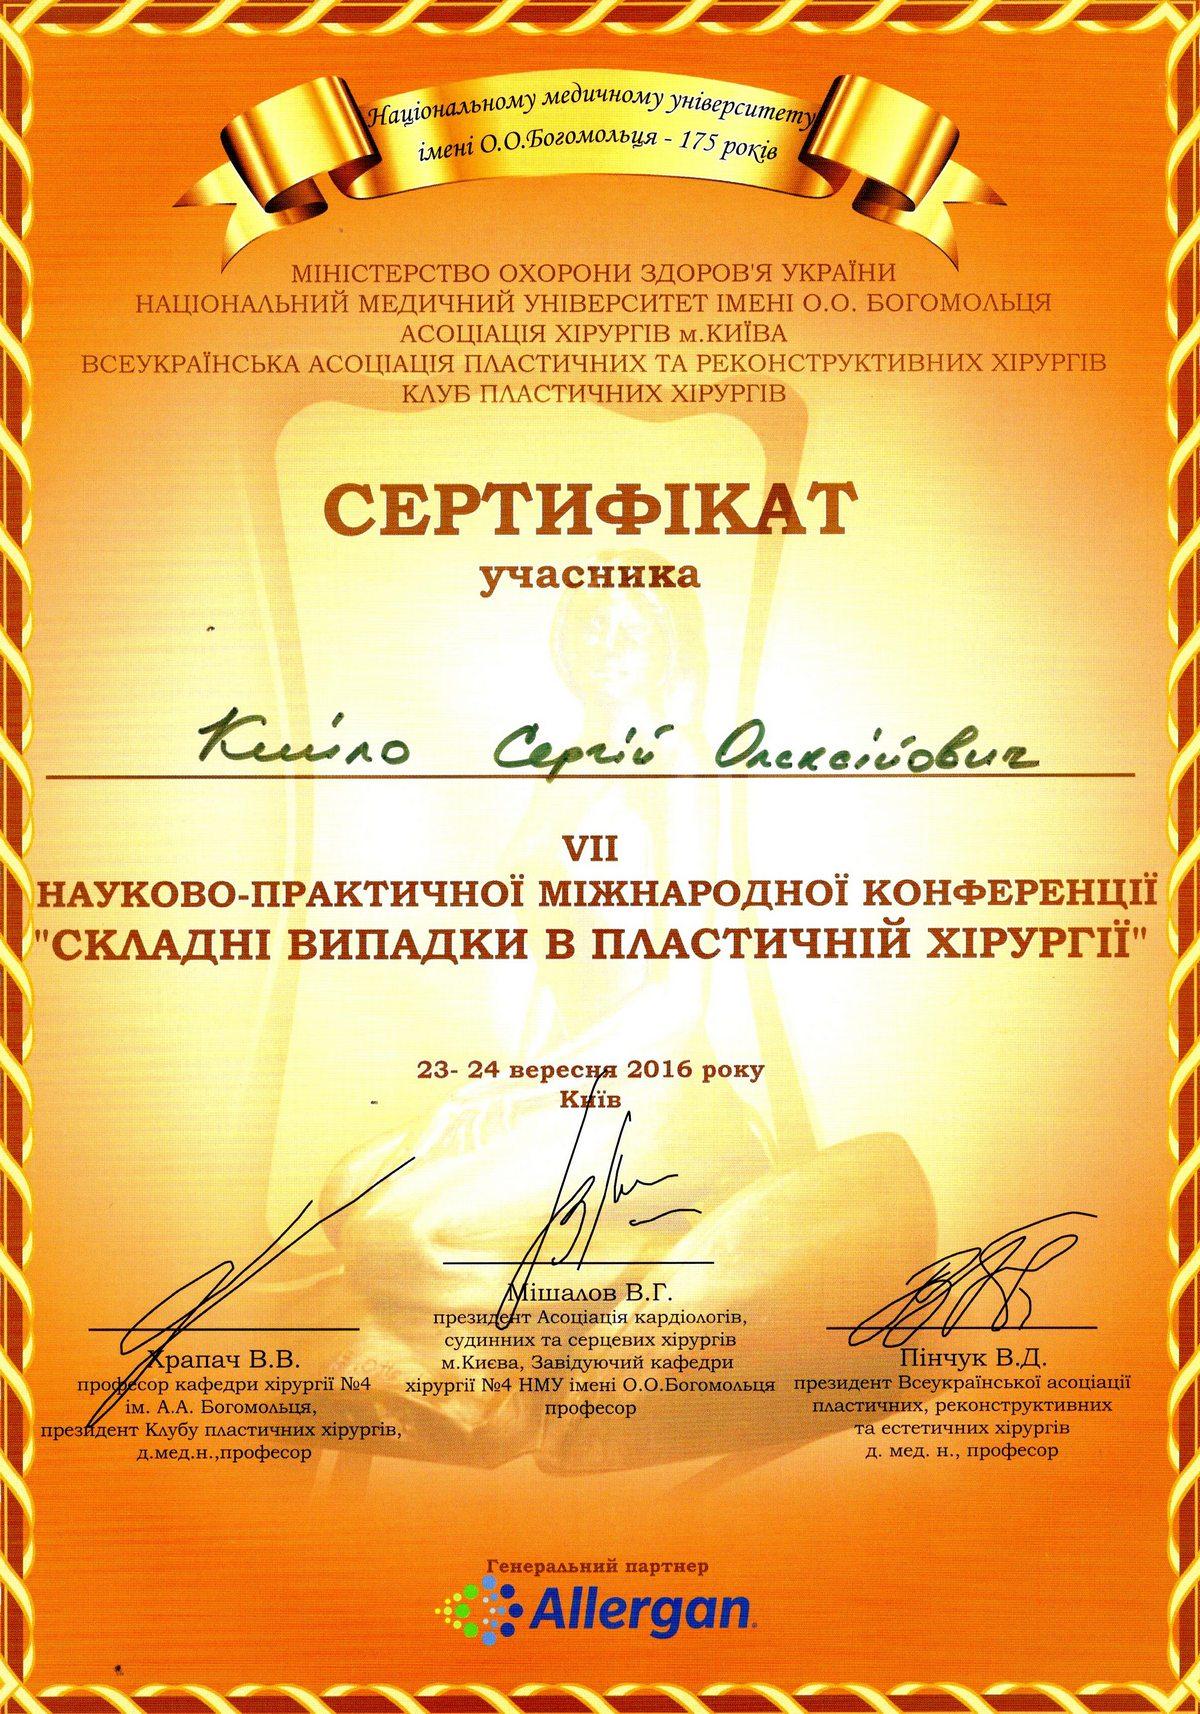 Документ №:19 Сертификат пластического хирурга Кийло Сергея Алексеевича